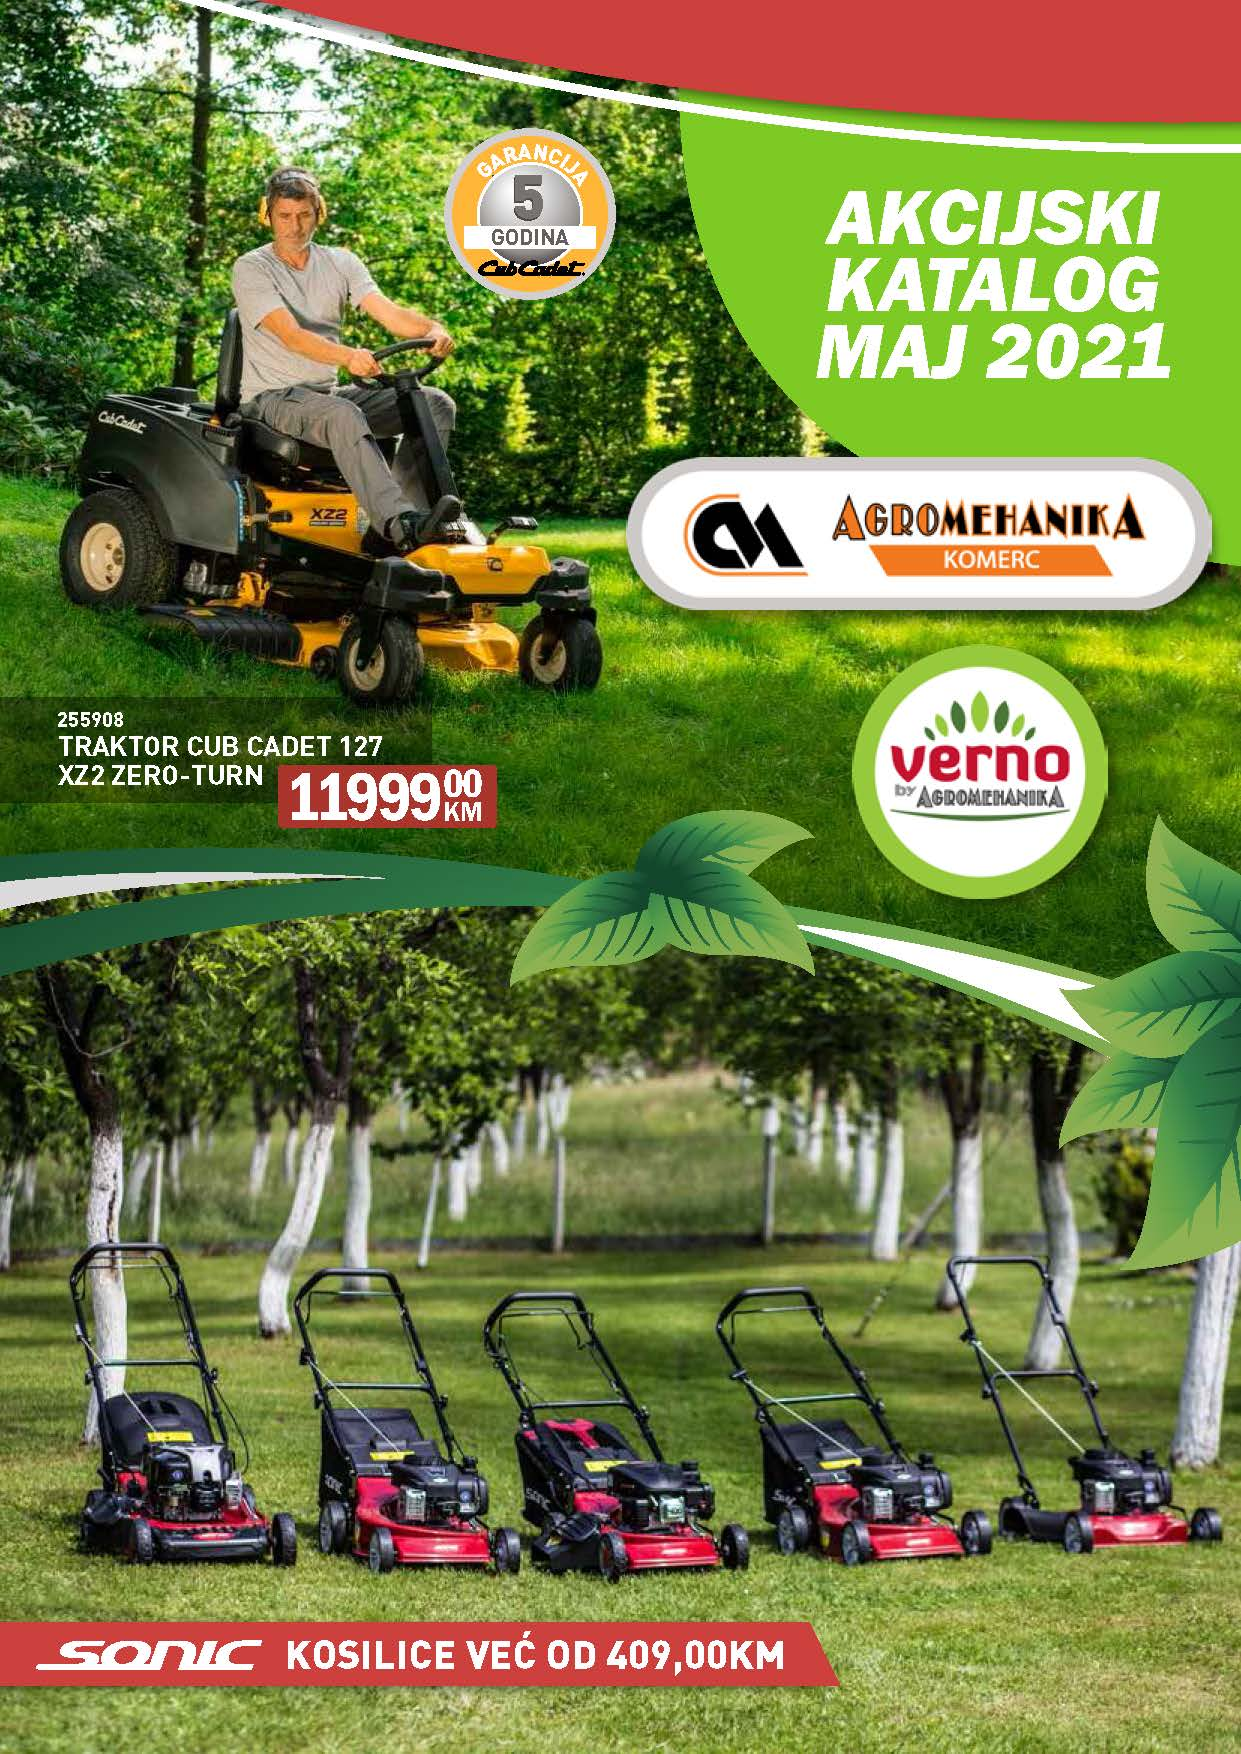 Maj 2021 Agromehanika Verno katalog 01.05.2021. 31.05.2021. Page 01